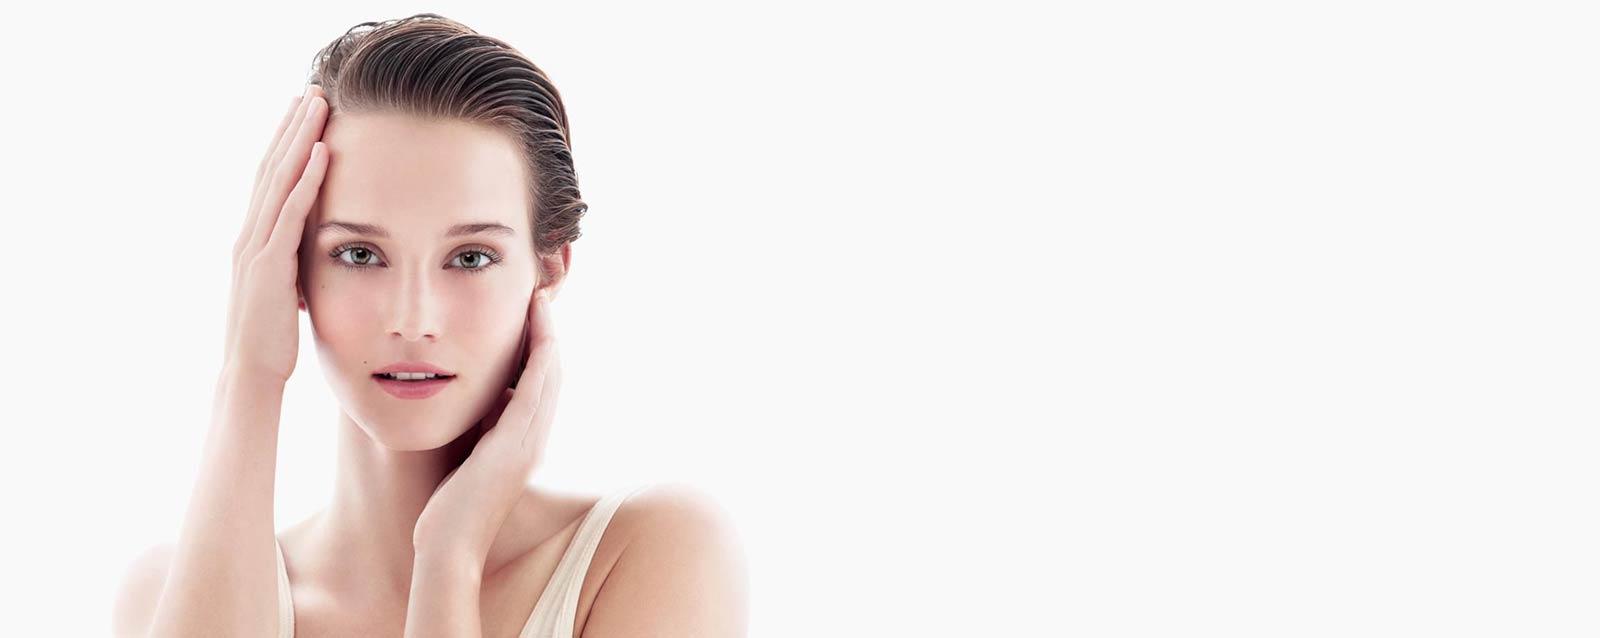 rotocolo: Limpeza de Pele Pré-Peeling Hidratante e Reparadora